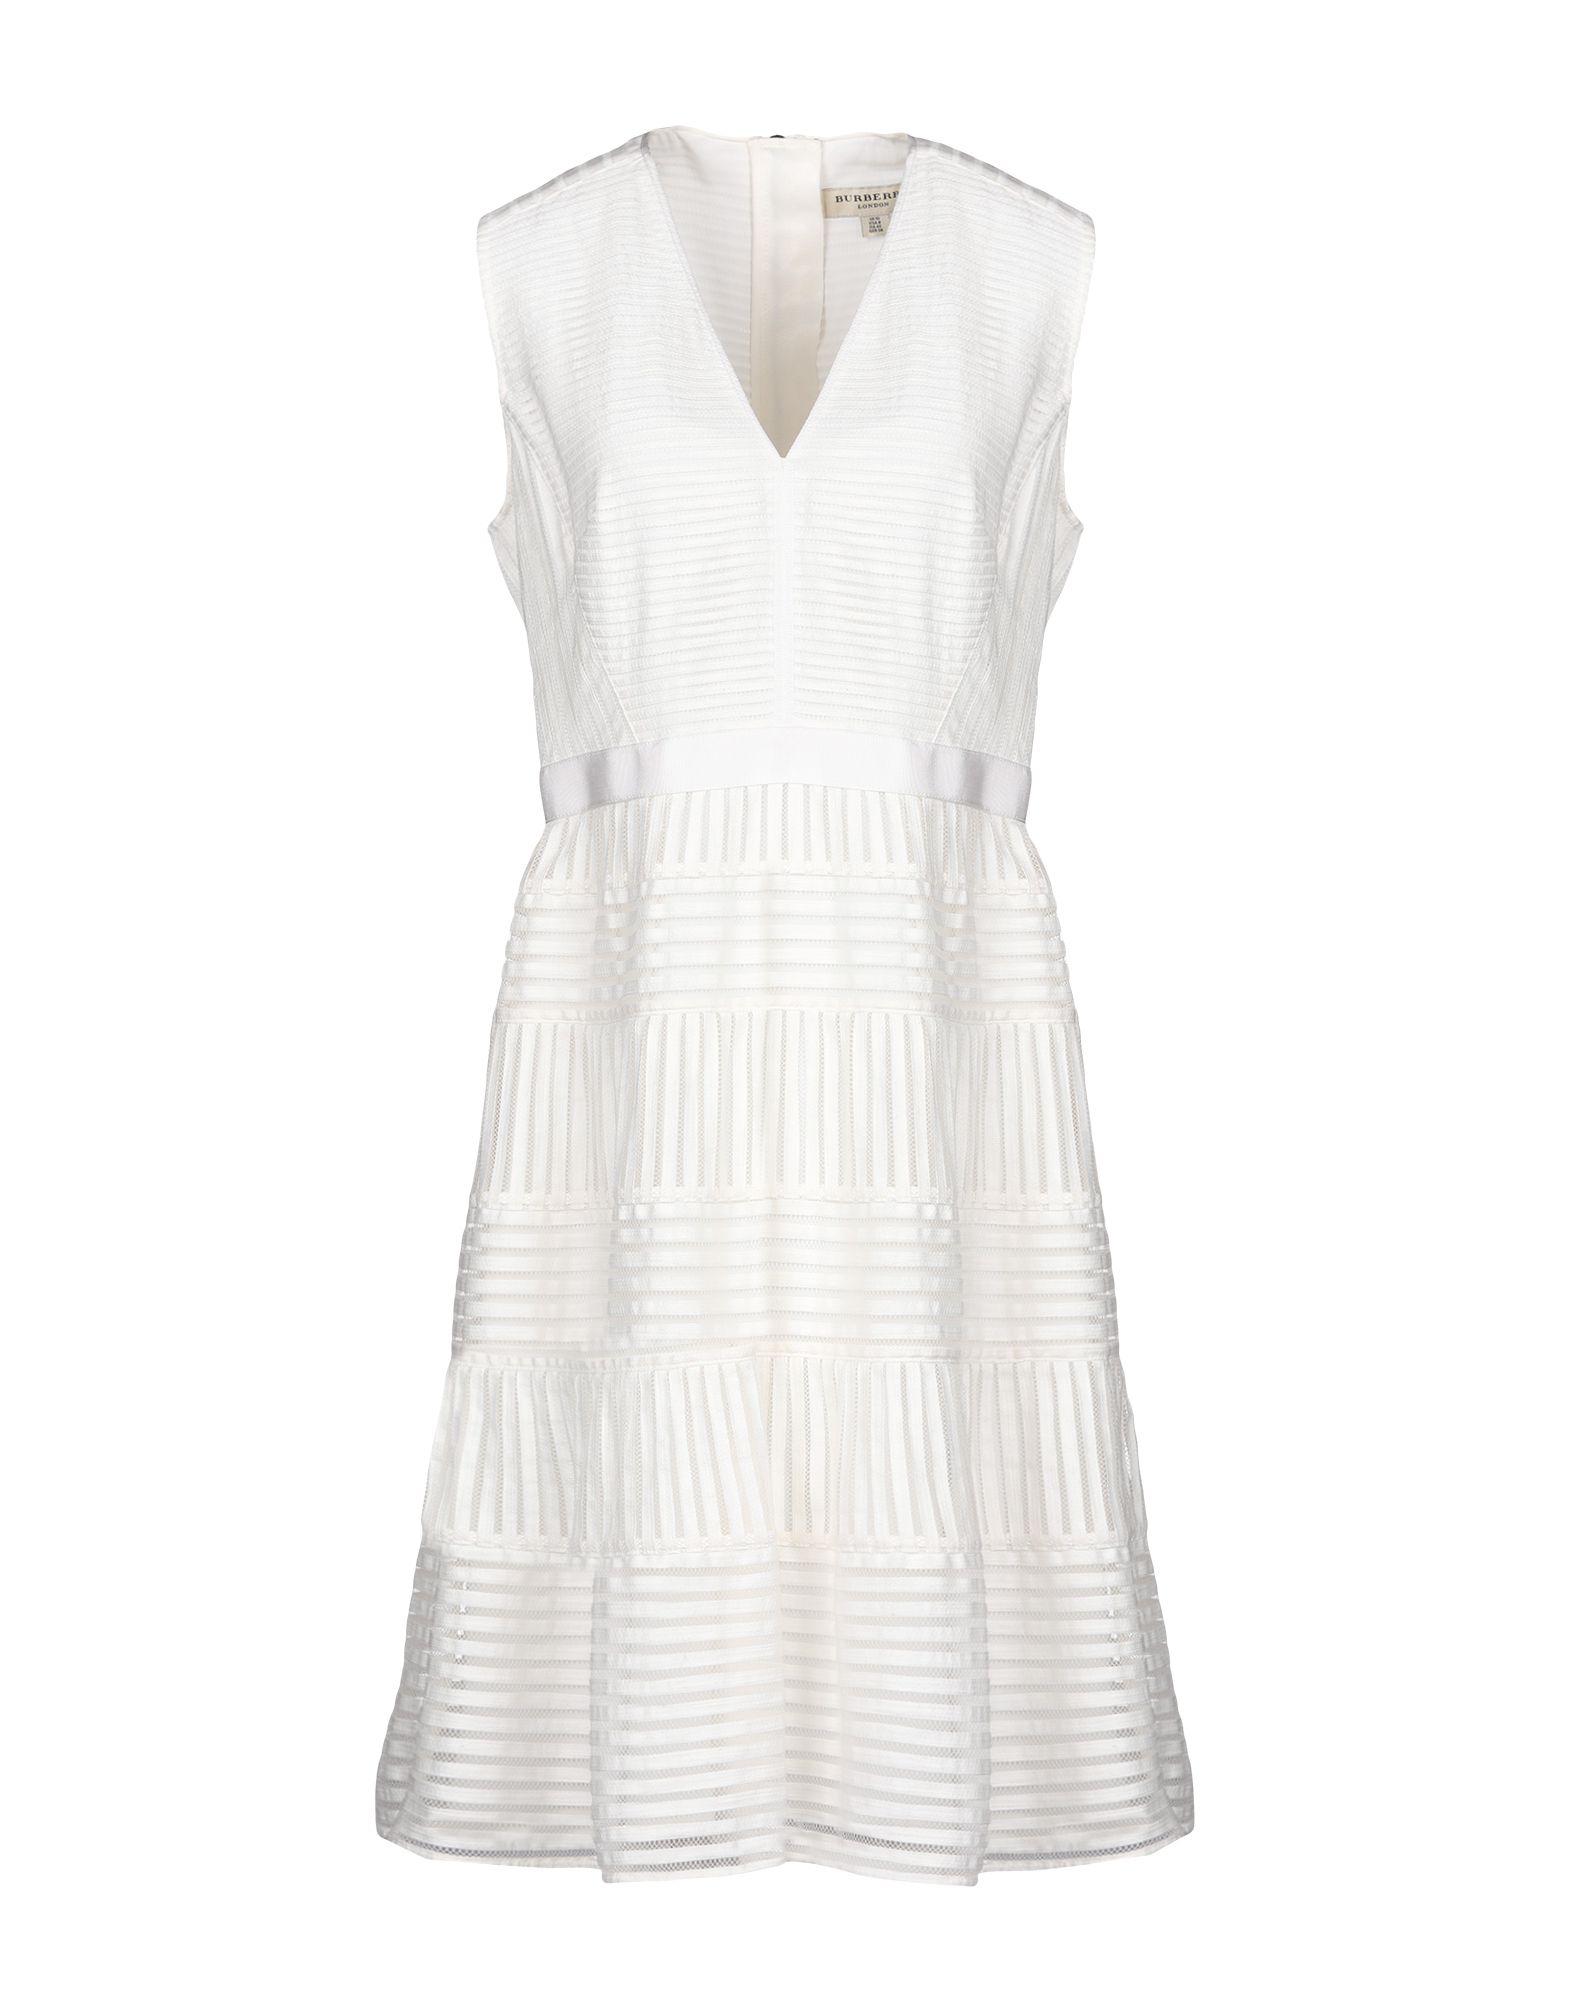 d4e3580a0f BURBERRY - Γυναικεία Φορέματα - Yoox